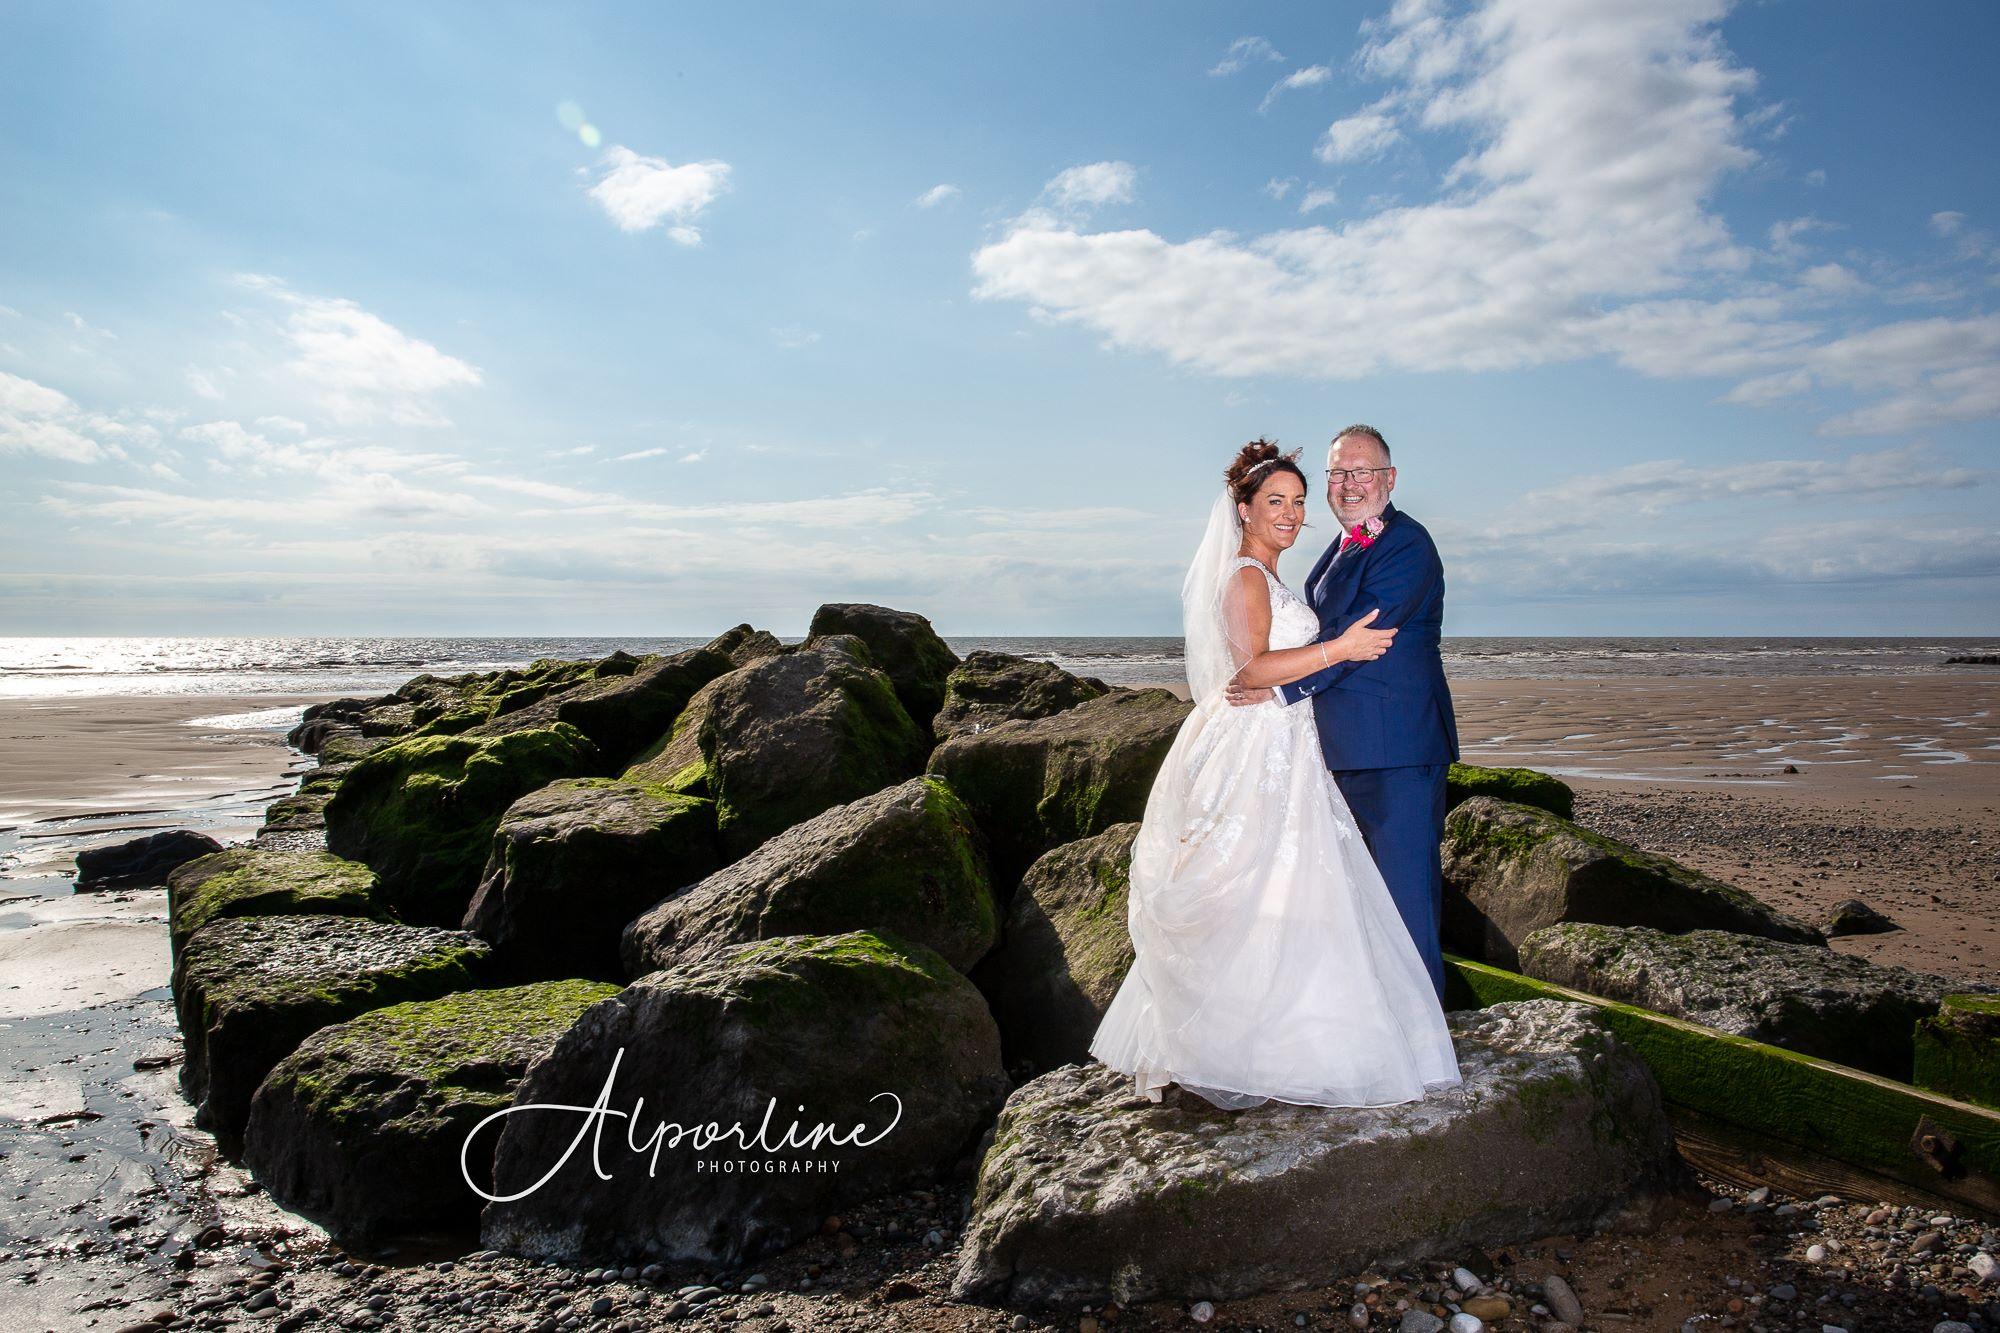 The-venue-wedding-photograph-fydle-wedding-photographer.jpg